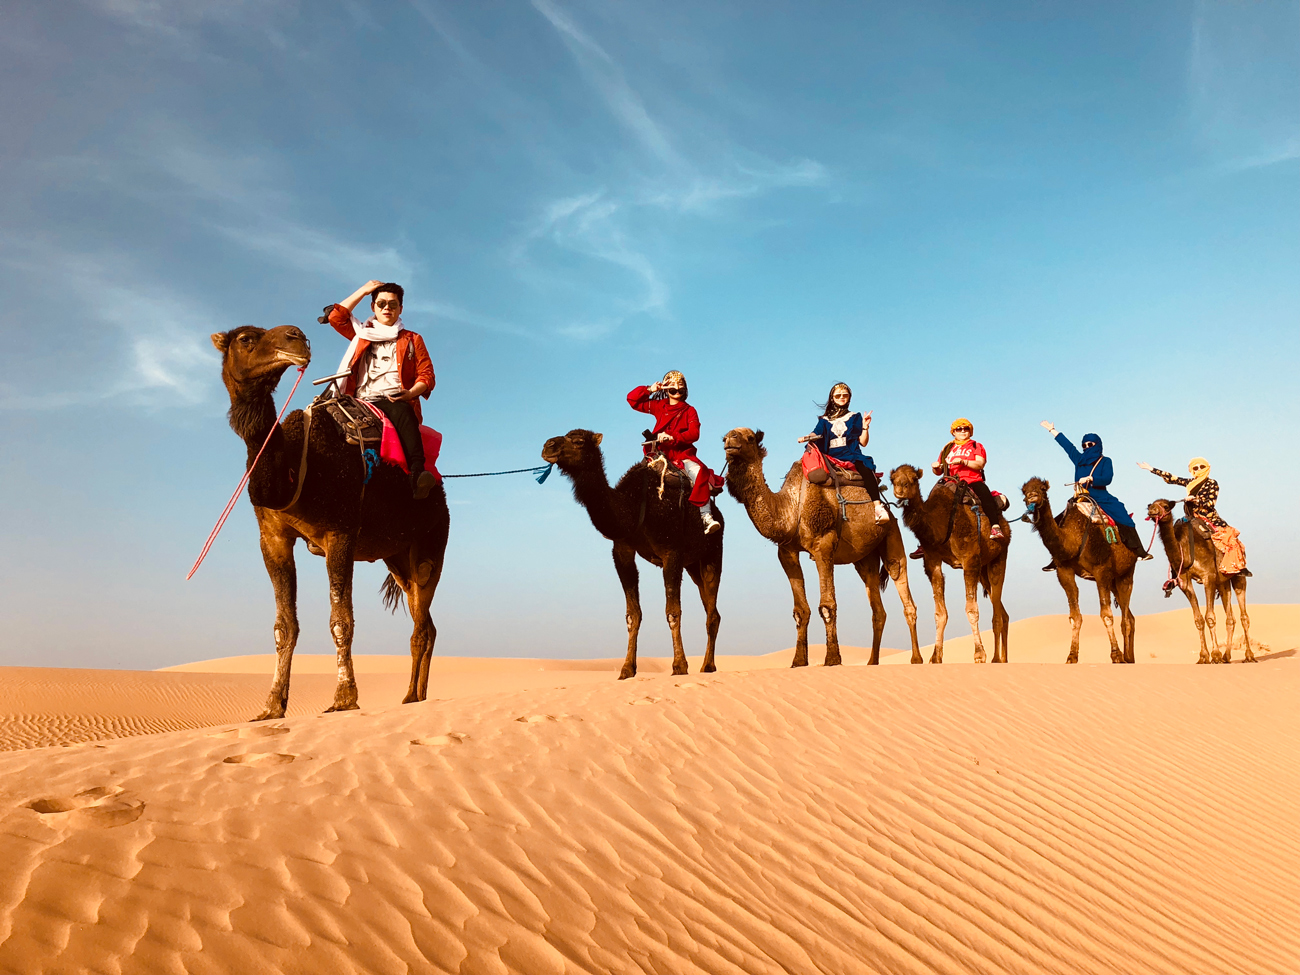 https://cameltrekking-in-merzouga.com/wp-content/uploads/2019/04/morocco-excursions-desert.jpg